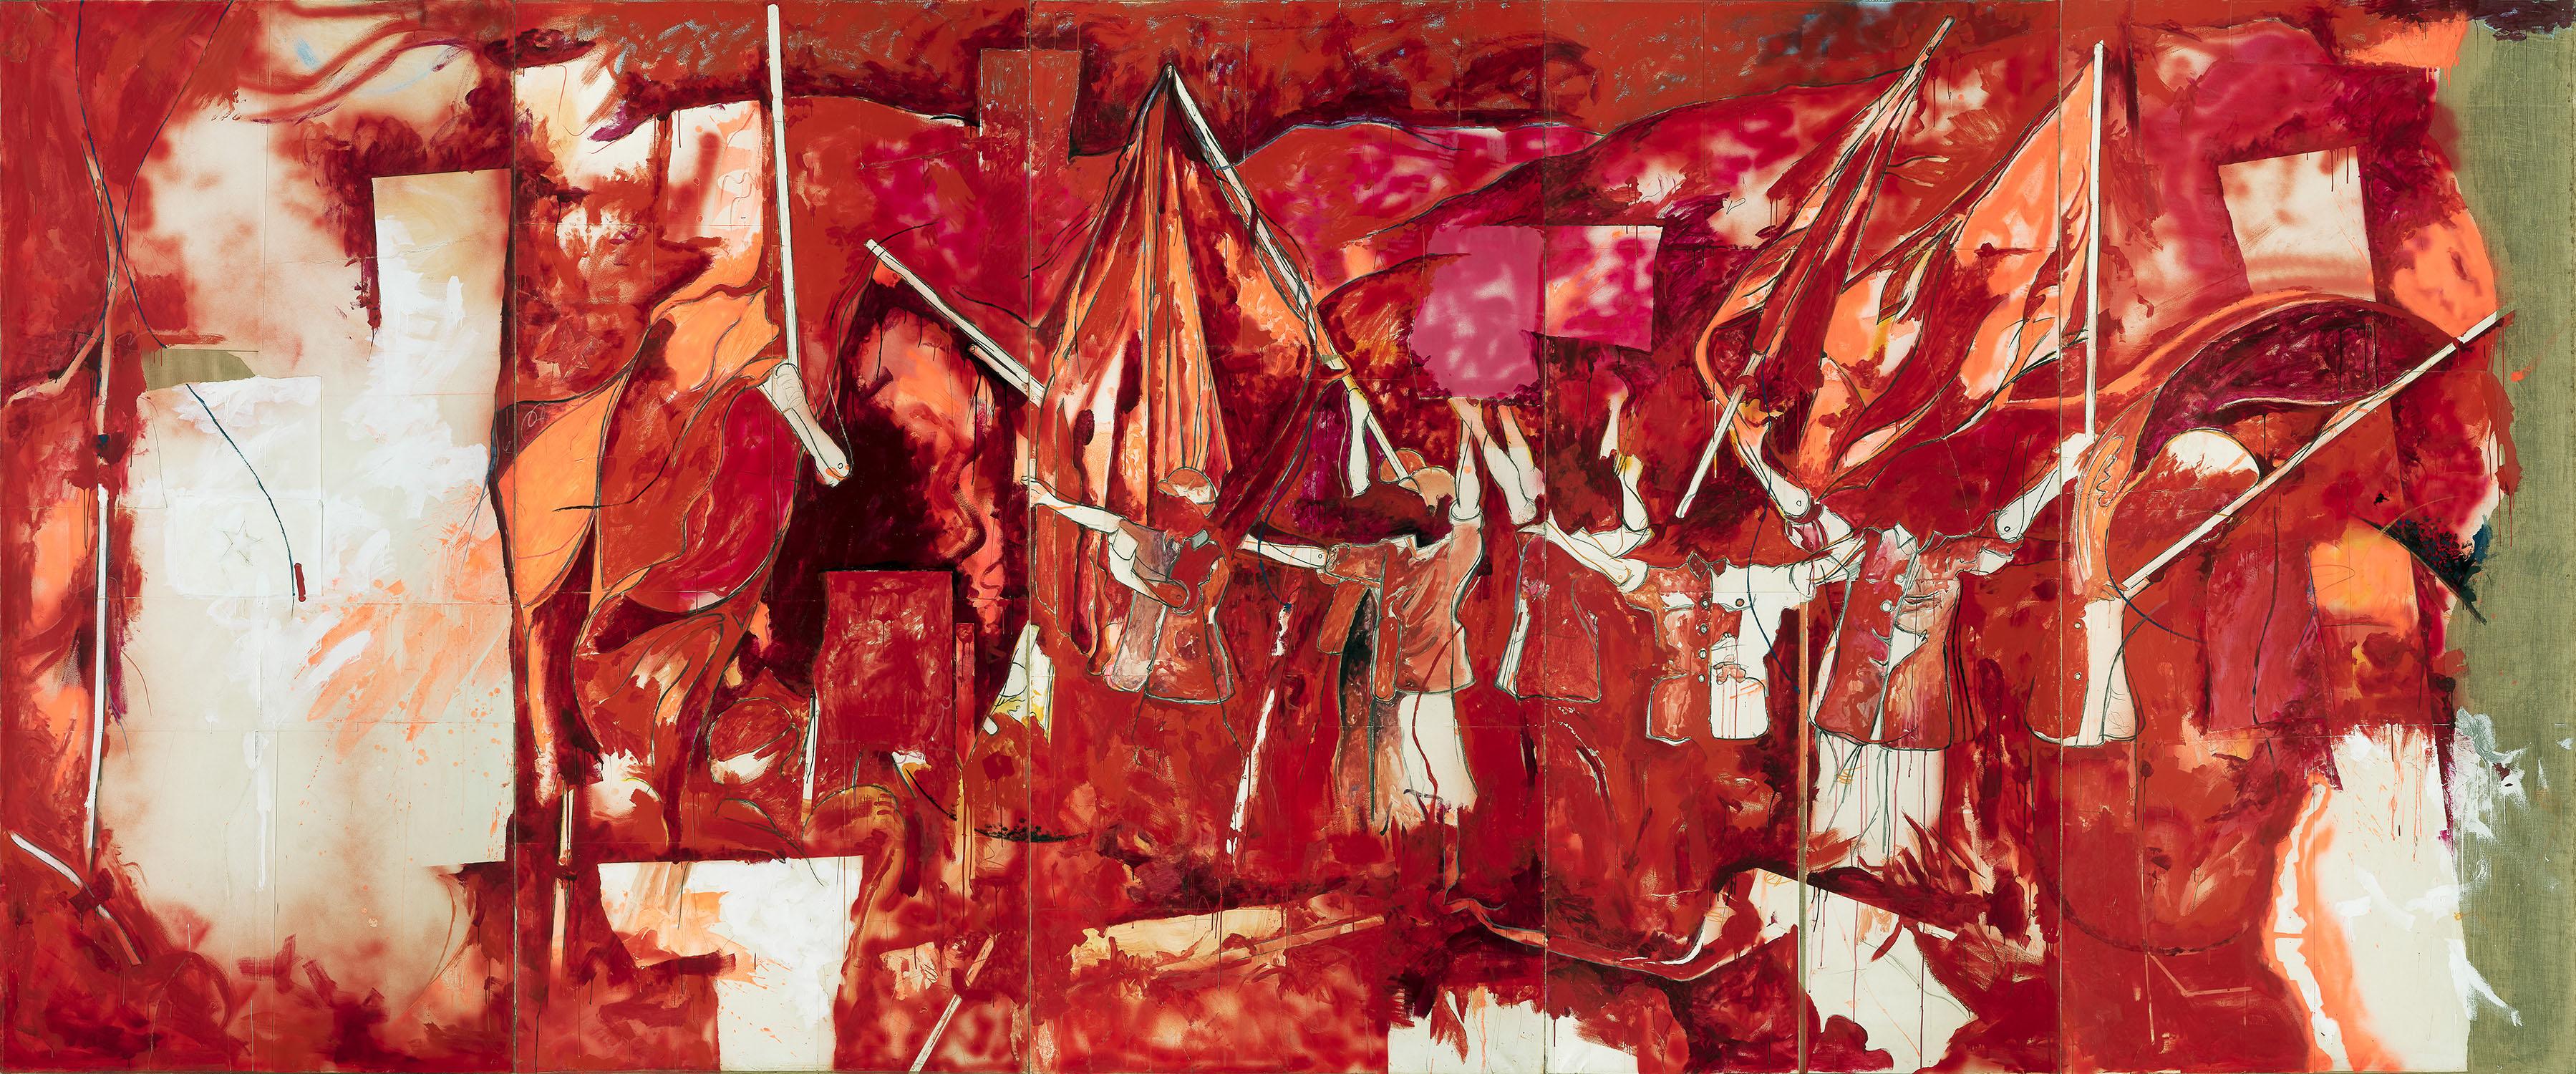 Mario Schifano, 'Festa cinese', 1968